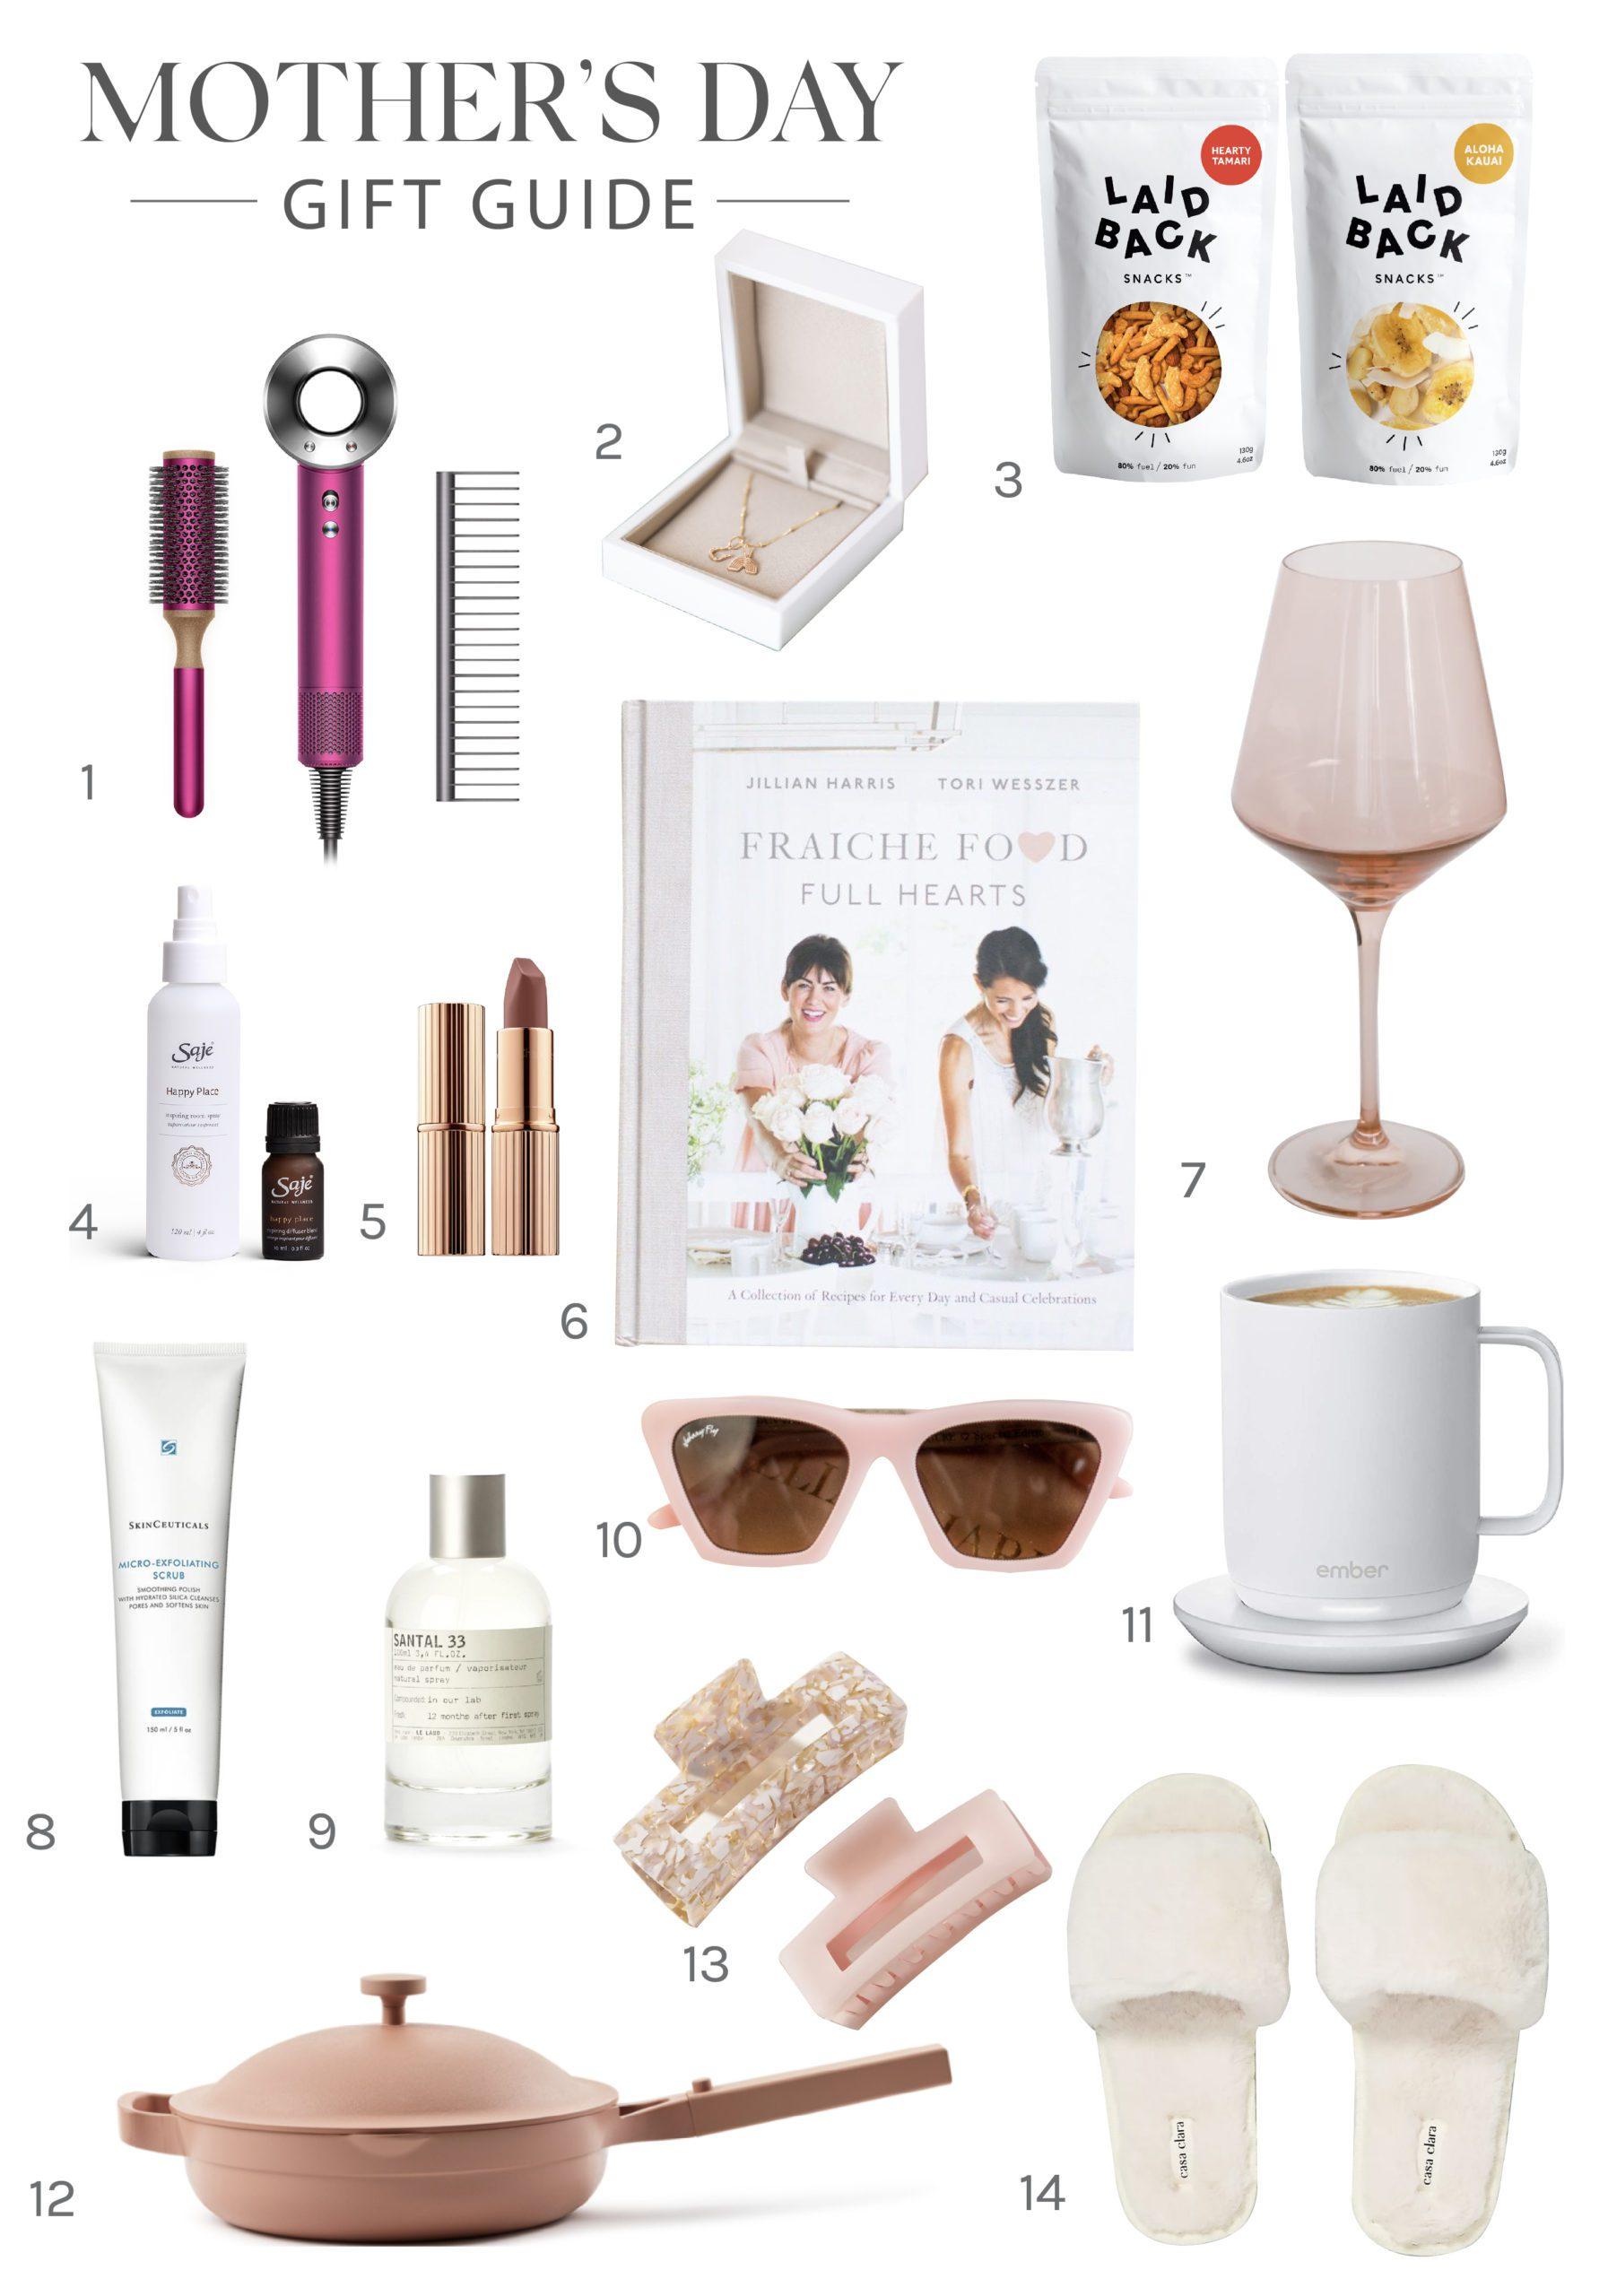 Jillian Harris Mother's Day Gift Guide 2021